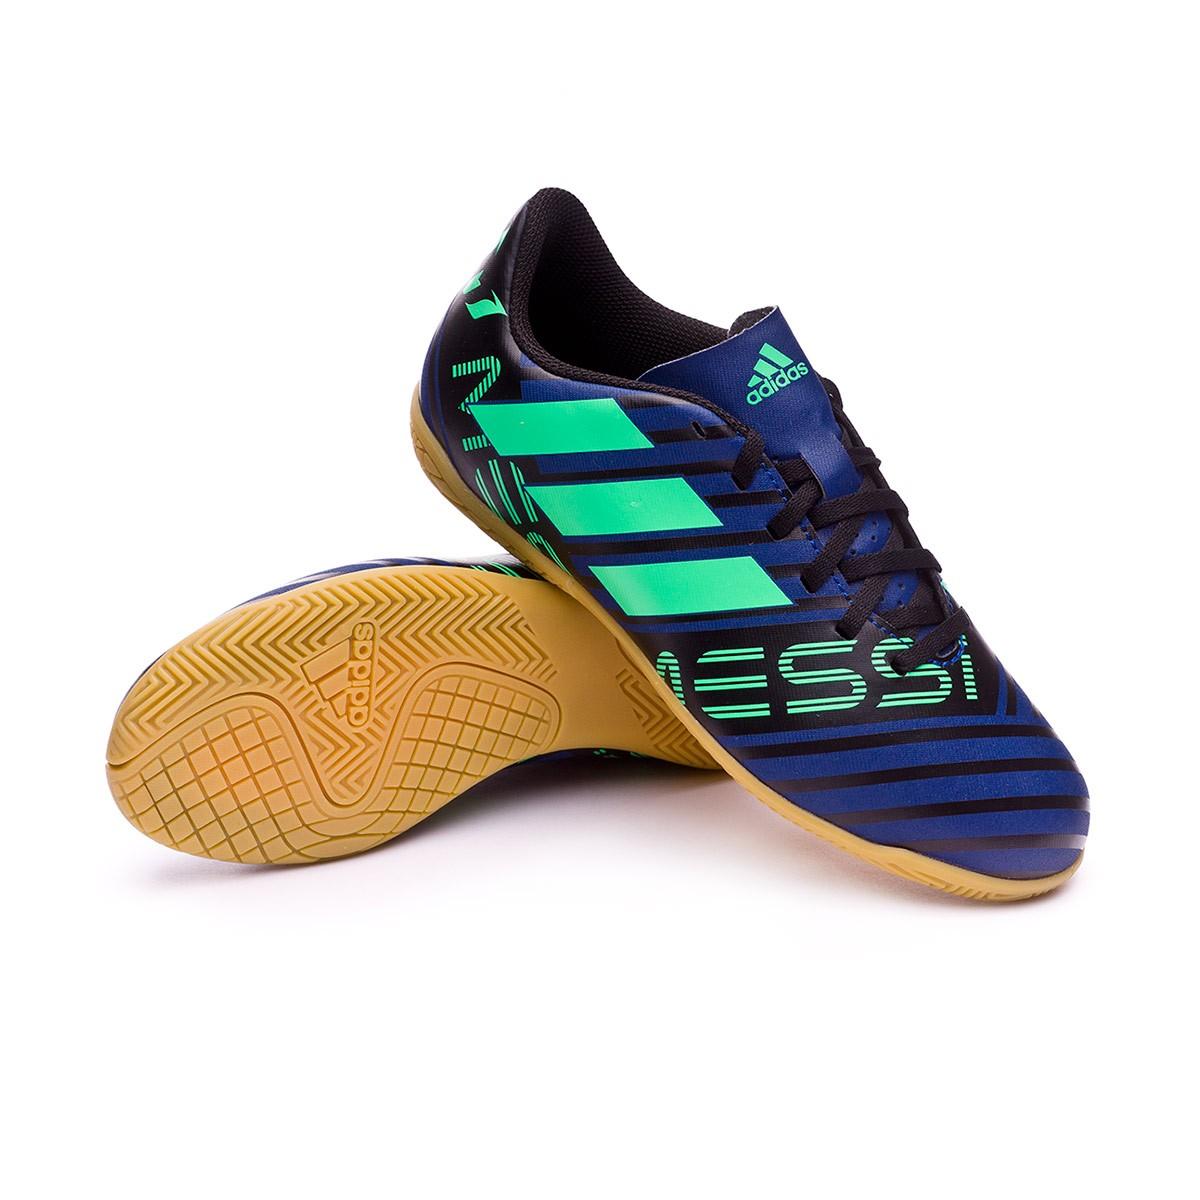 00bcb23c86b30 Zapatilla adidas Nemeziz Messi Tango 17.4 IN Niño Unity ink-Hi-res  green-Core black - Tienda de fútbol Fútbol Emotion